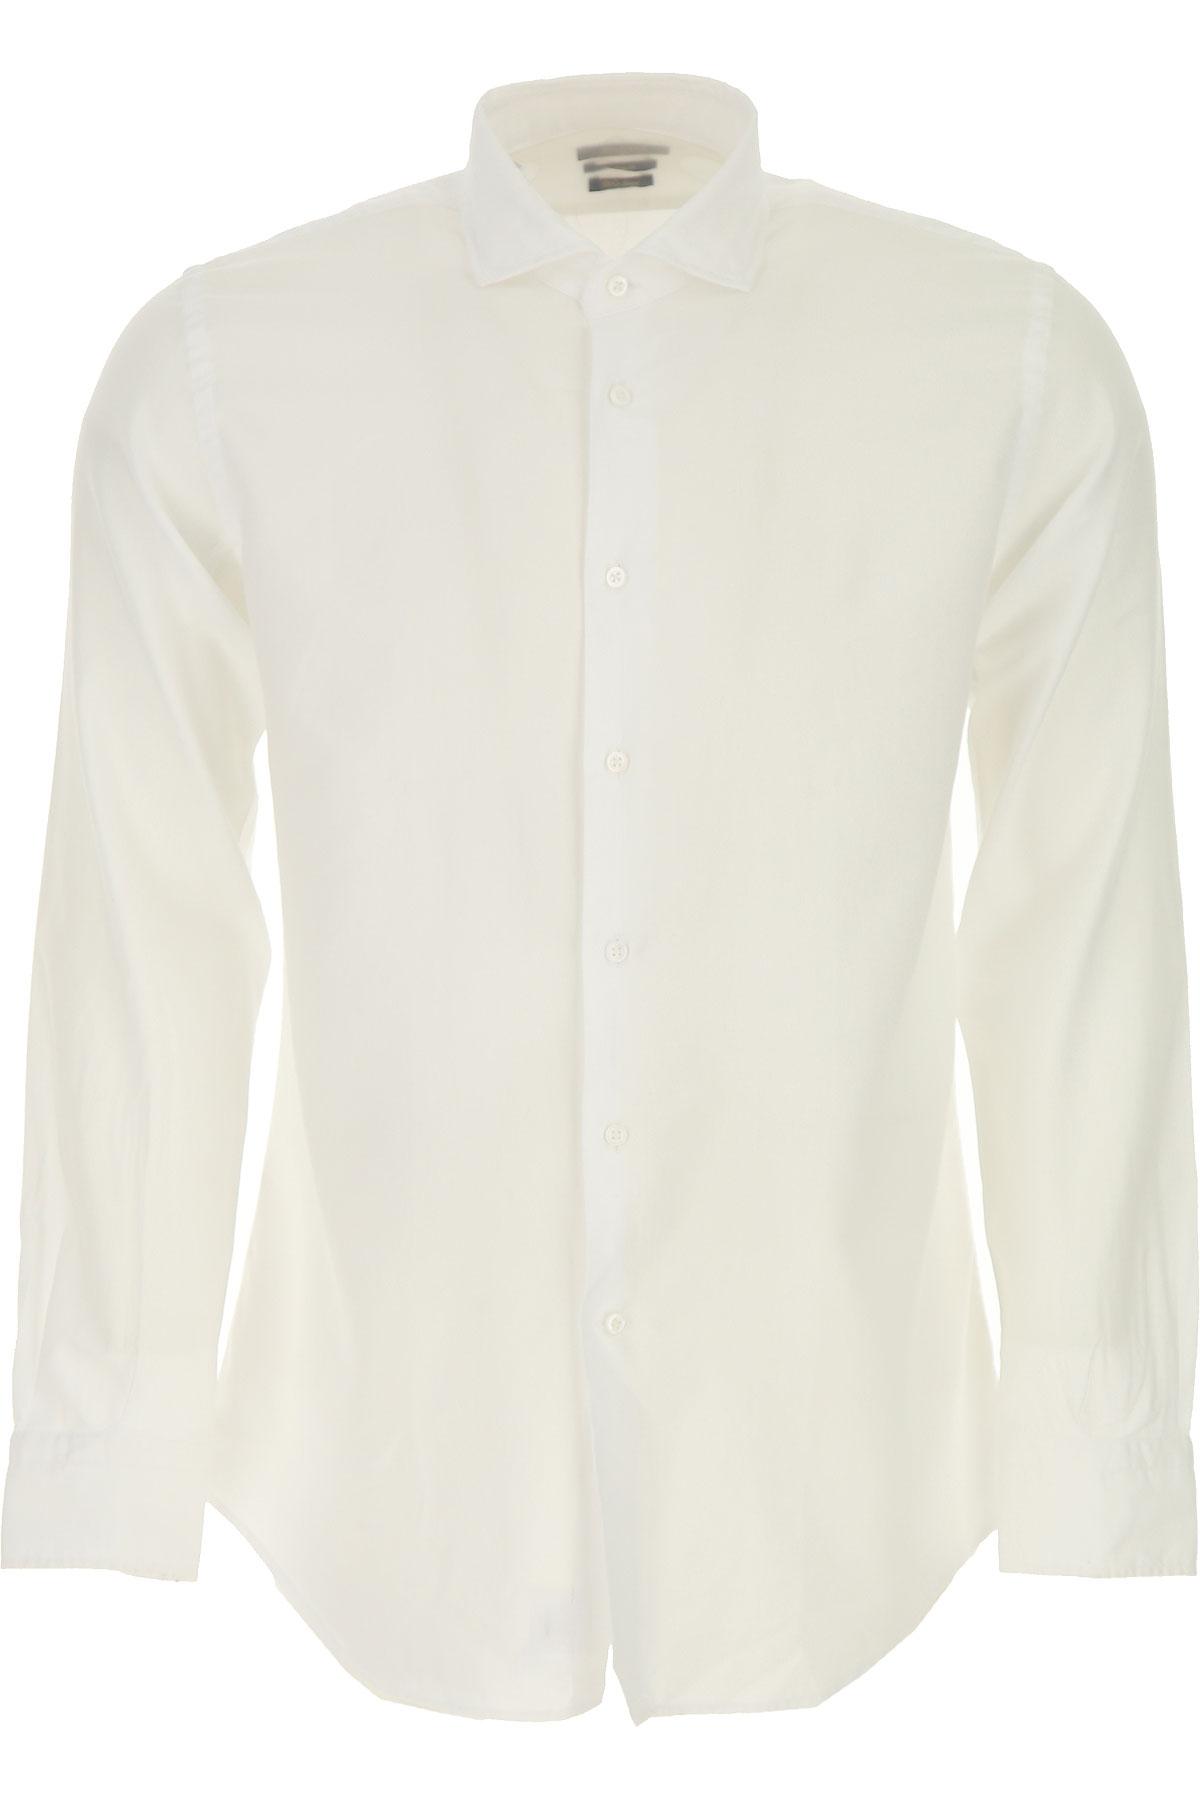 Del Siena Shirt for Men On Sale, White, Cotton, 2019, 15.5 15.75 16.5 17 17.5